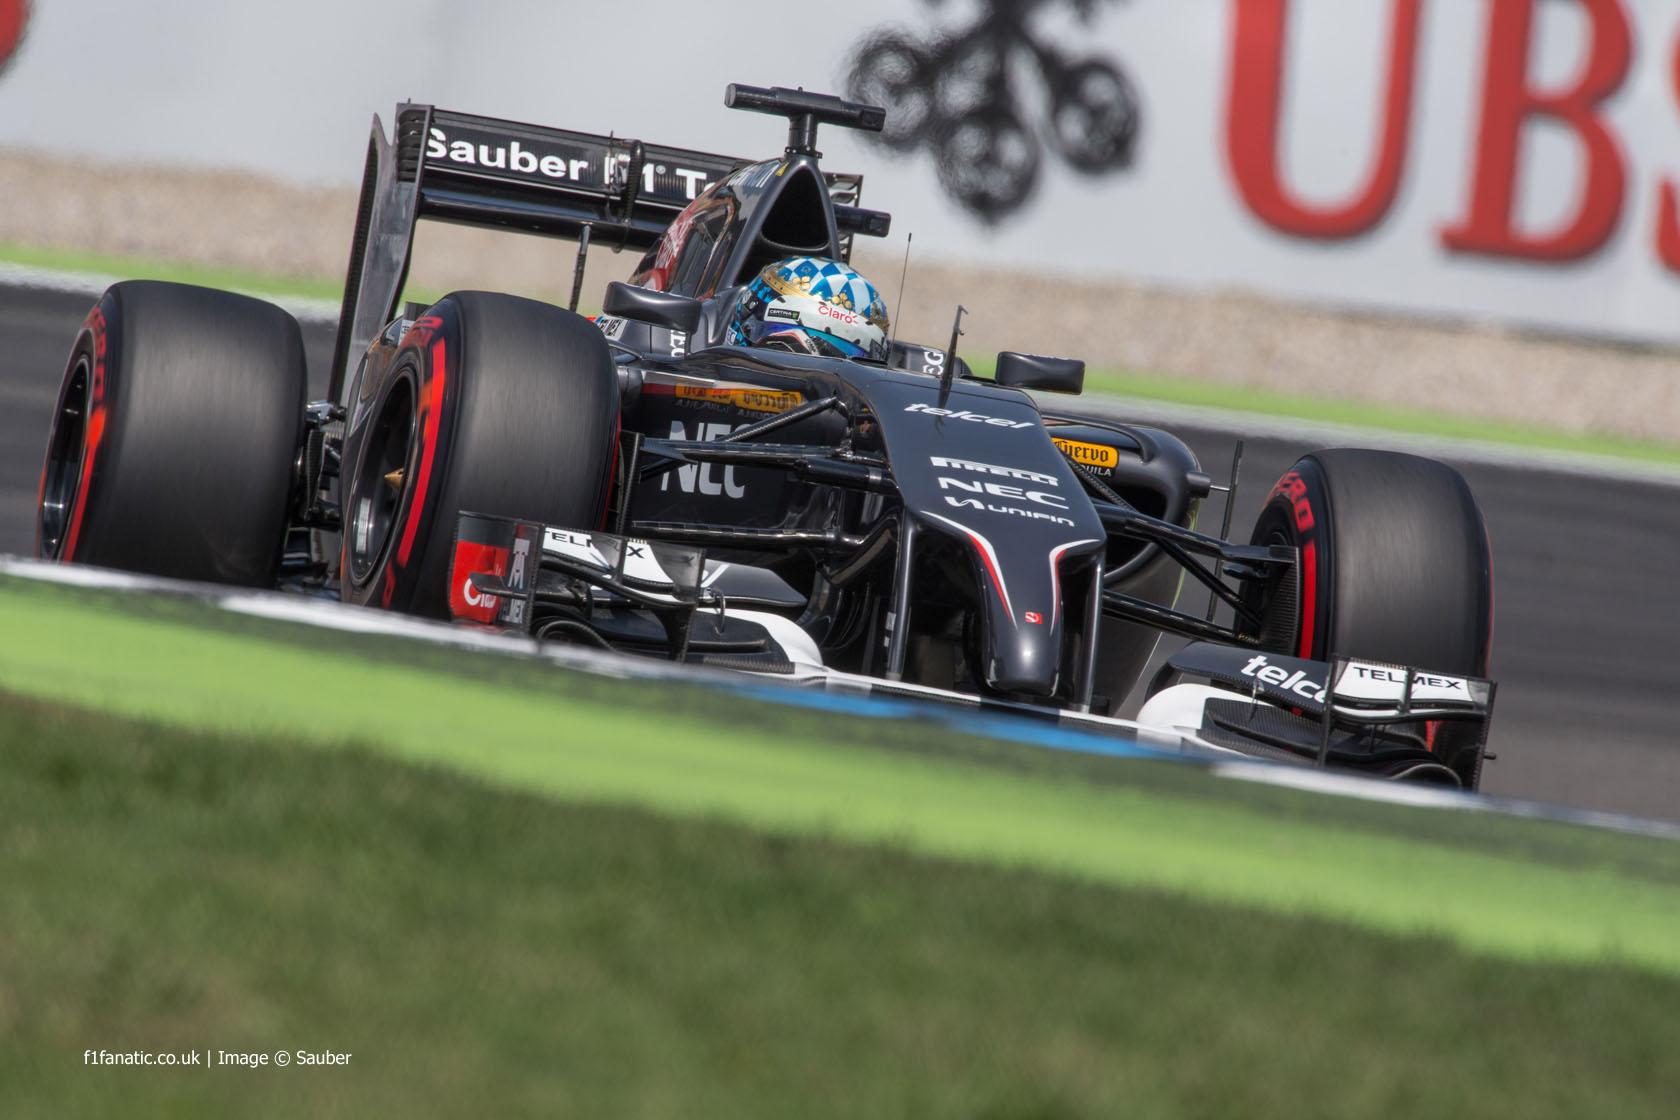 Adrian Sutil, Sauber, Hockenheimring, Saturday, 2014 My